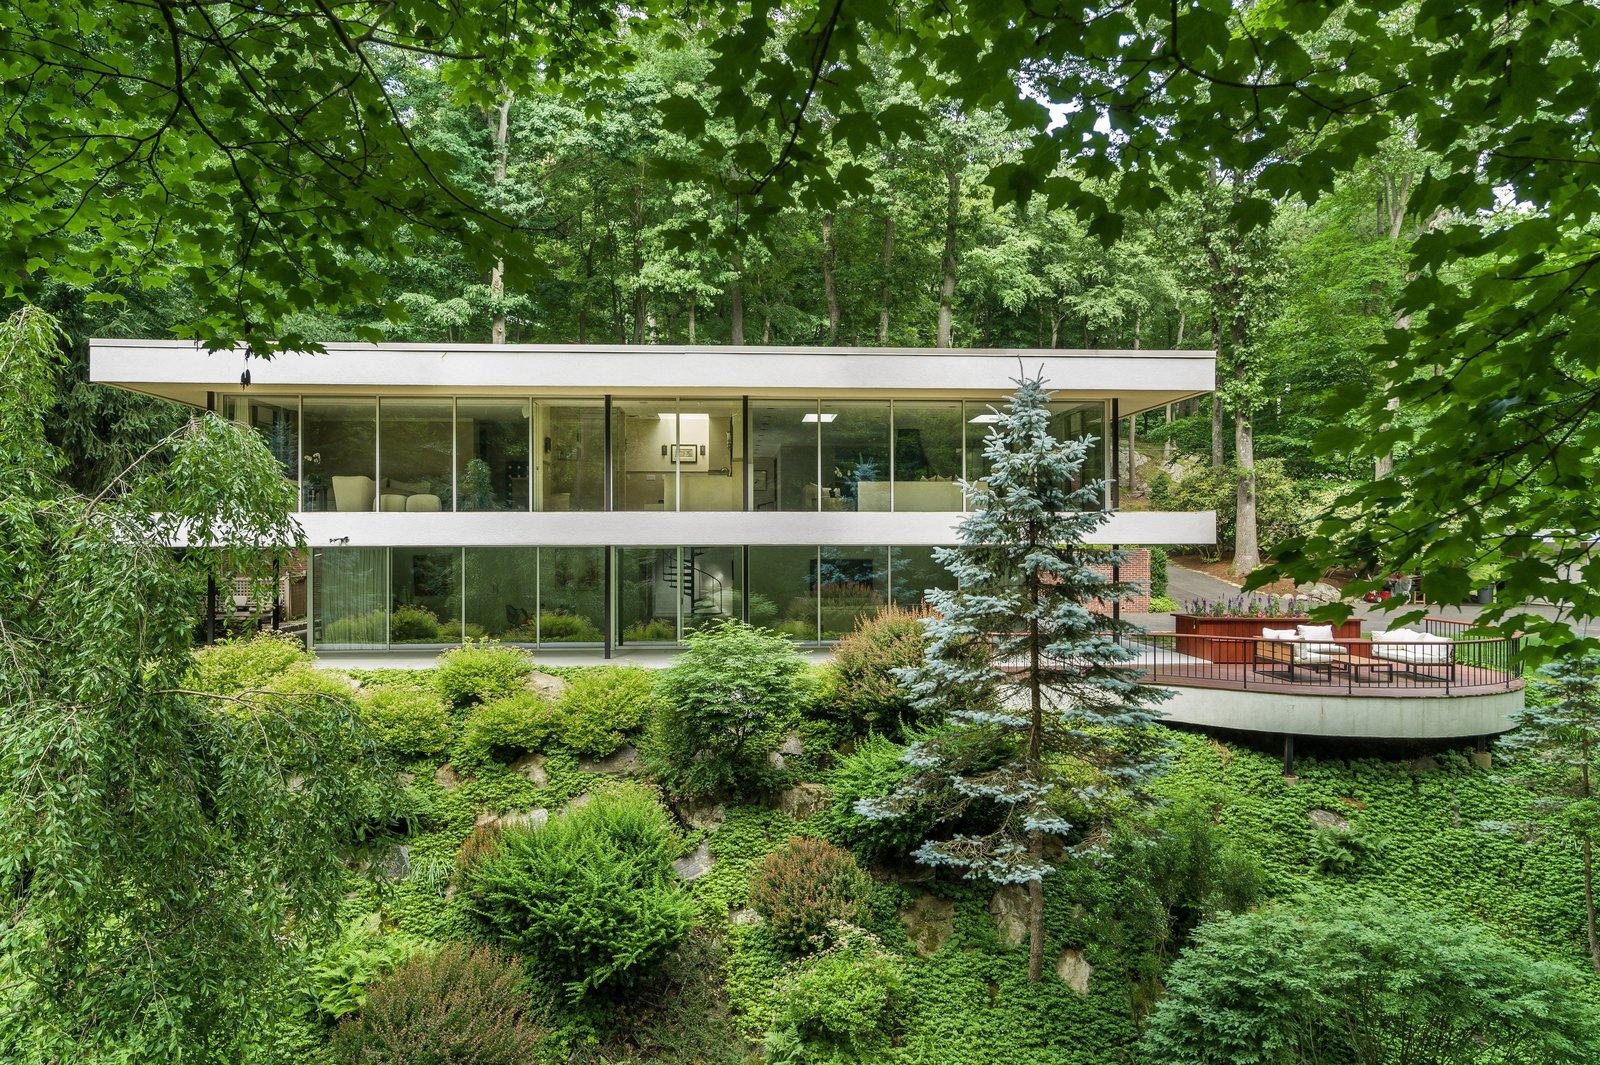 Skidmore, Owings & Merrill midcentury home exterior